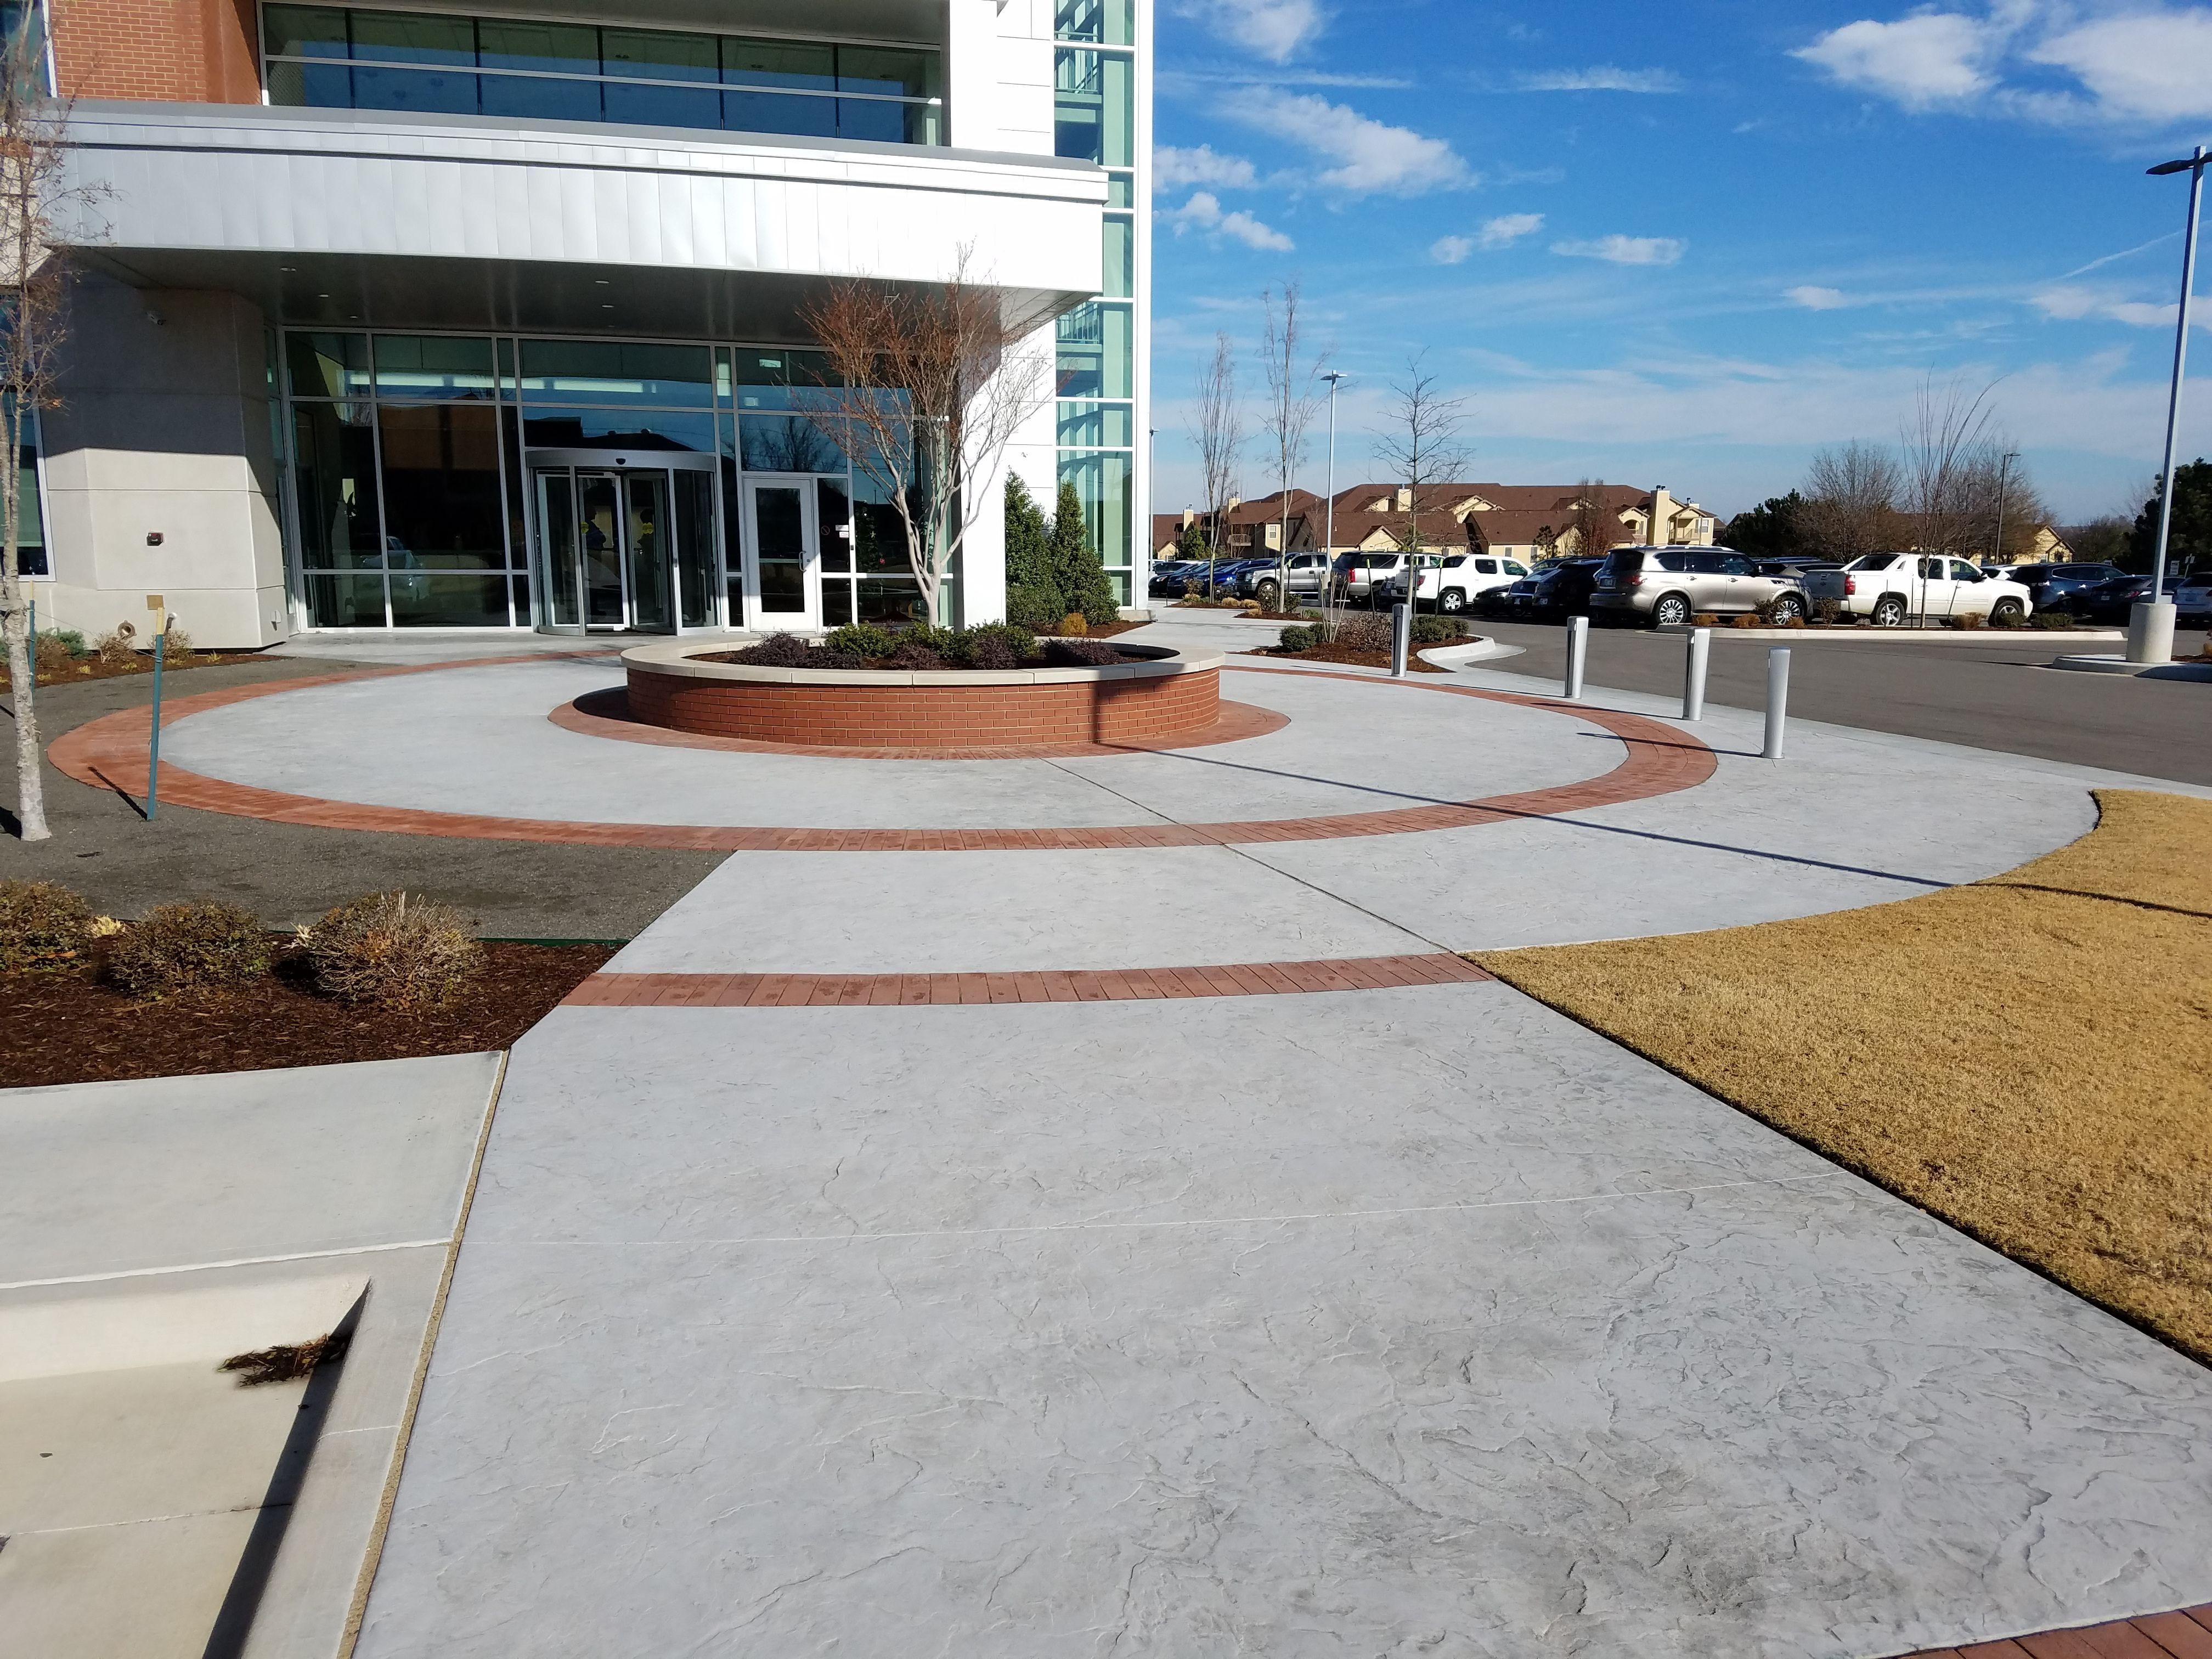 Tulsa Teachers Credit Union (TTCU) using Bomanite Imprint Systems with Bomacron Patterns in Tulsa, OK